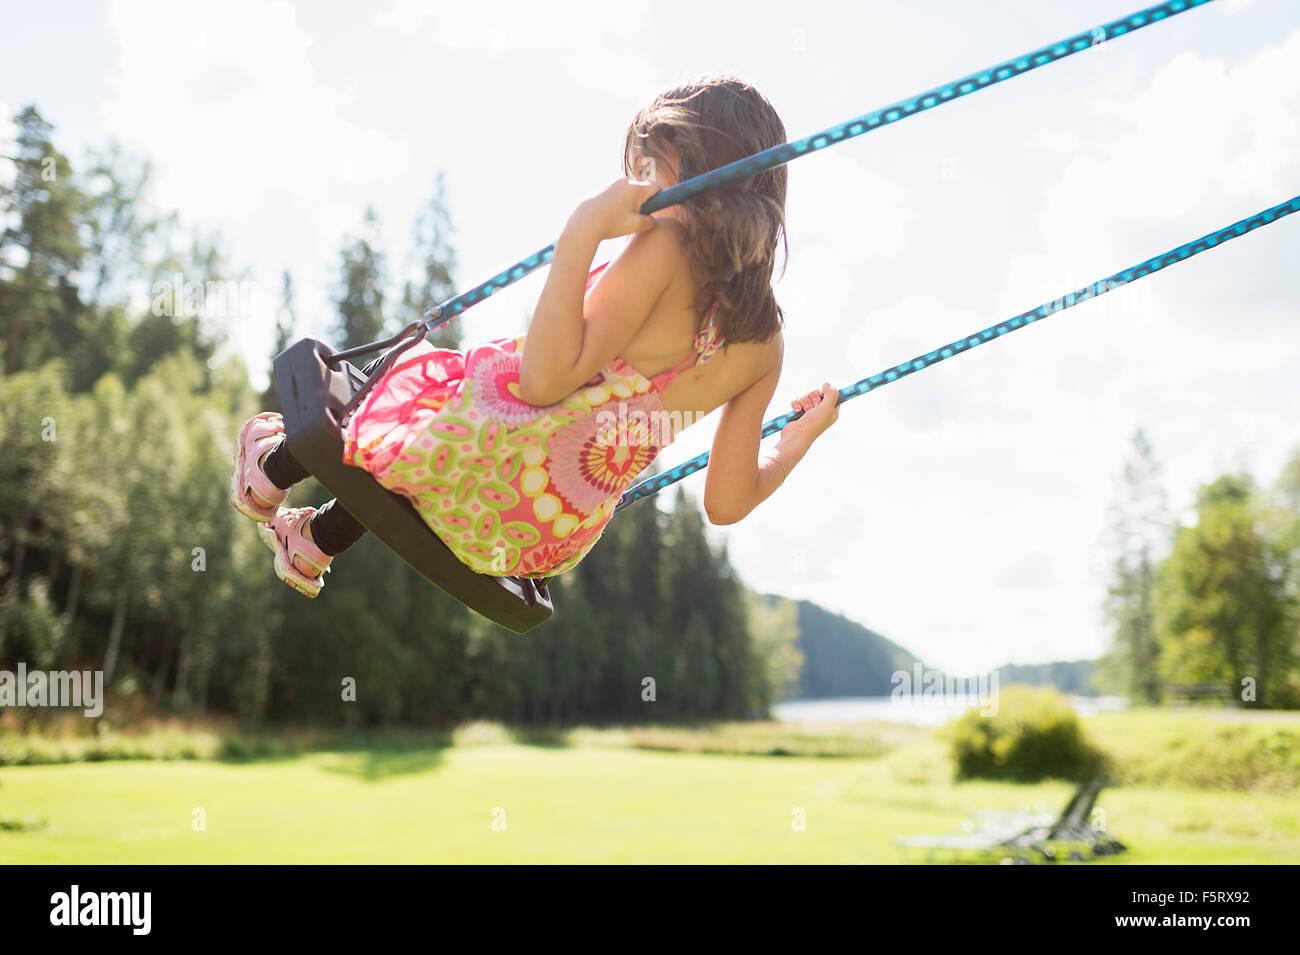 Sweden, Vastmanland, Bergslagen, Girl (6-7) on swing - Stock Image